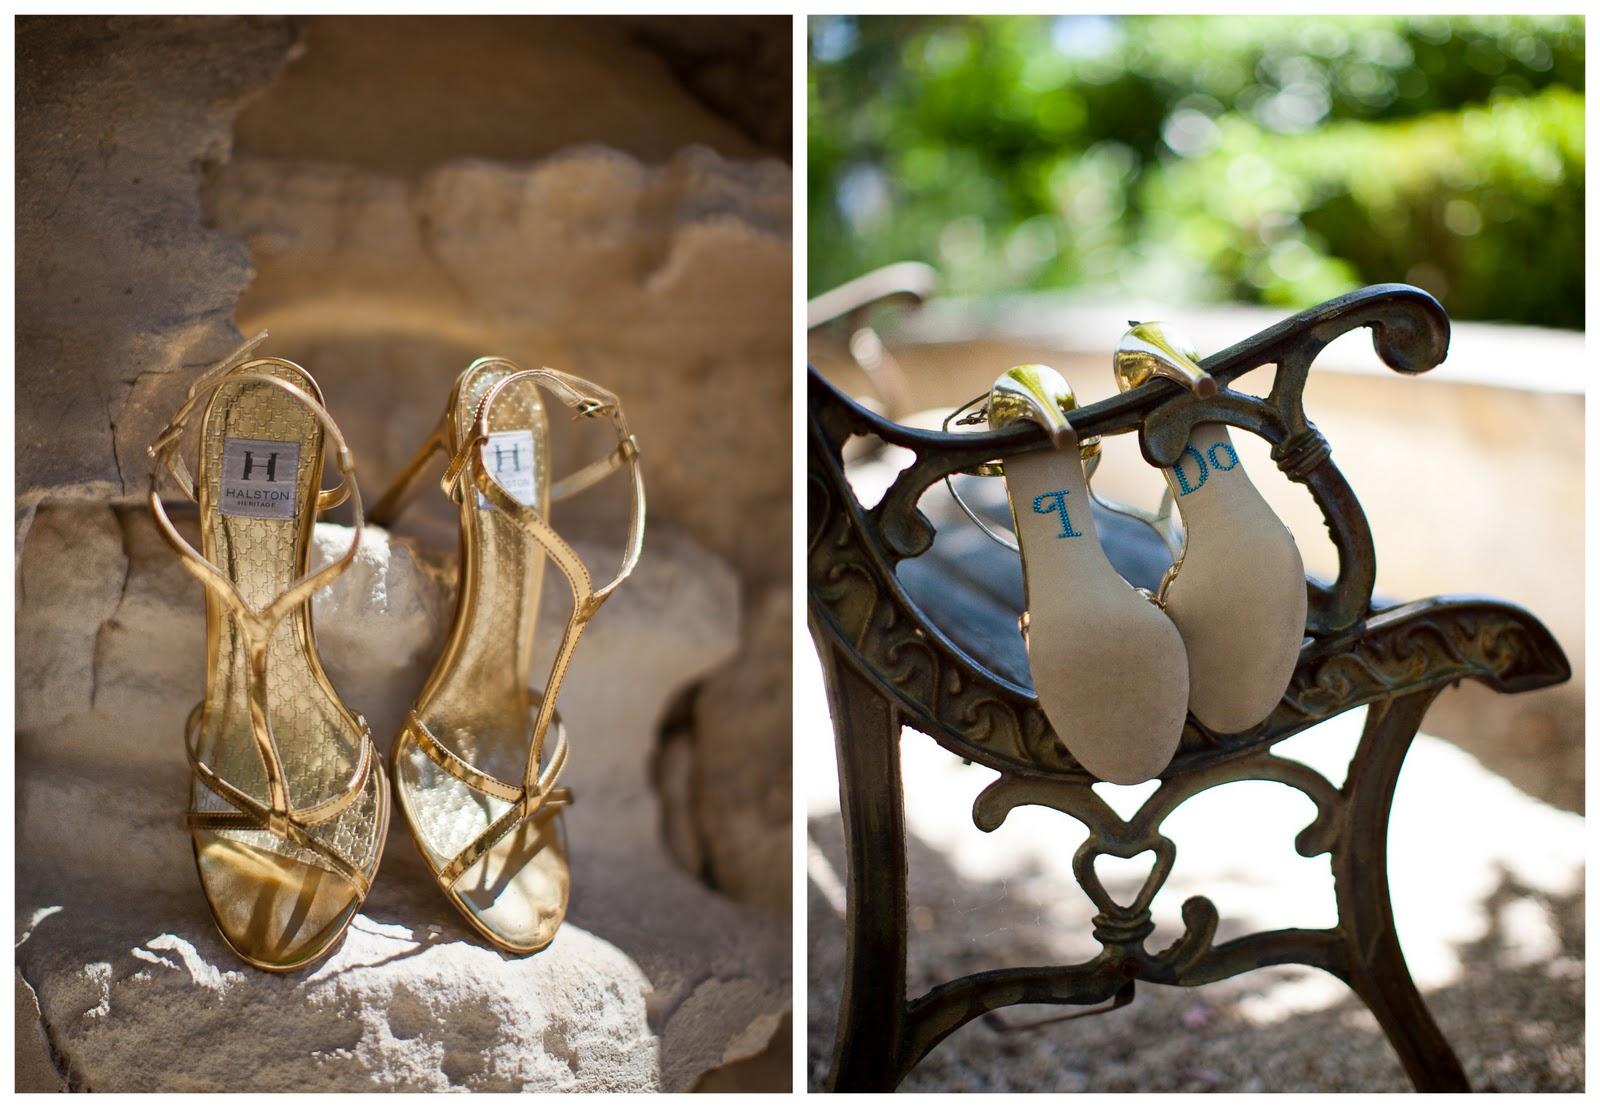 My Secret Garden: My Secret Garden Wedding In A Provence Chateau